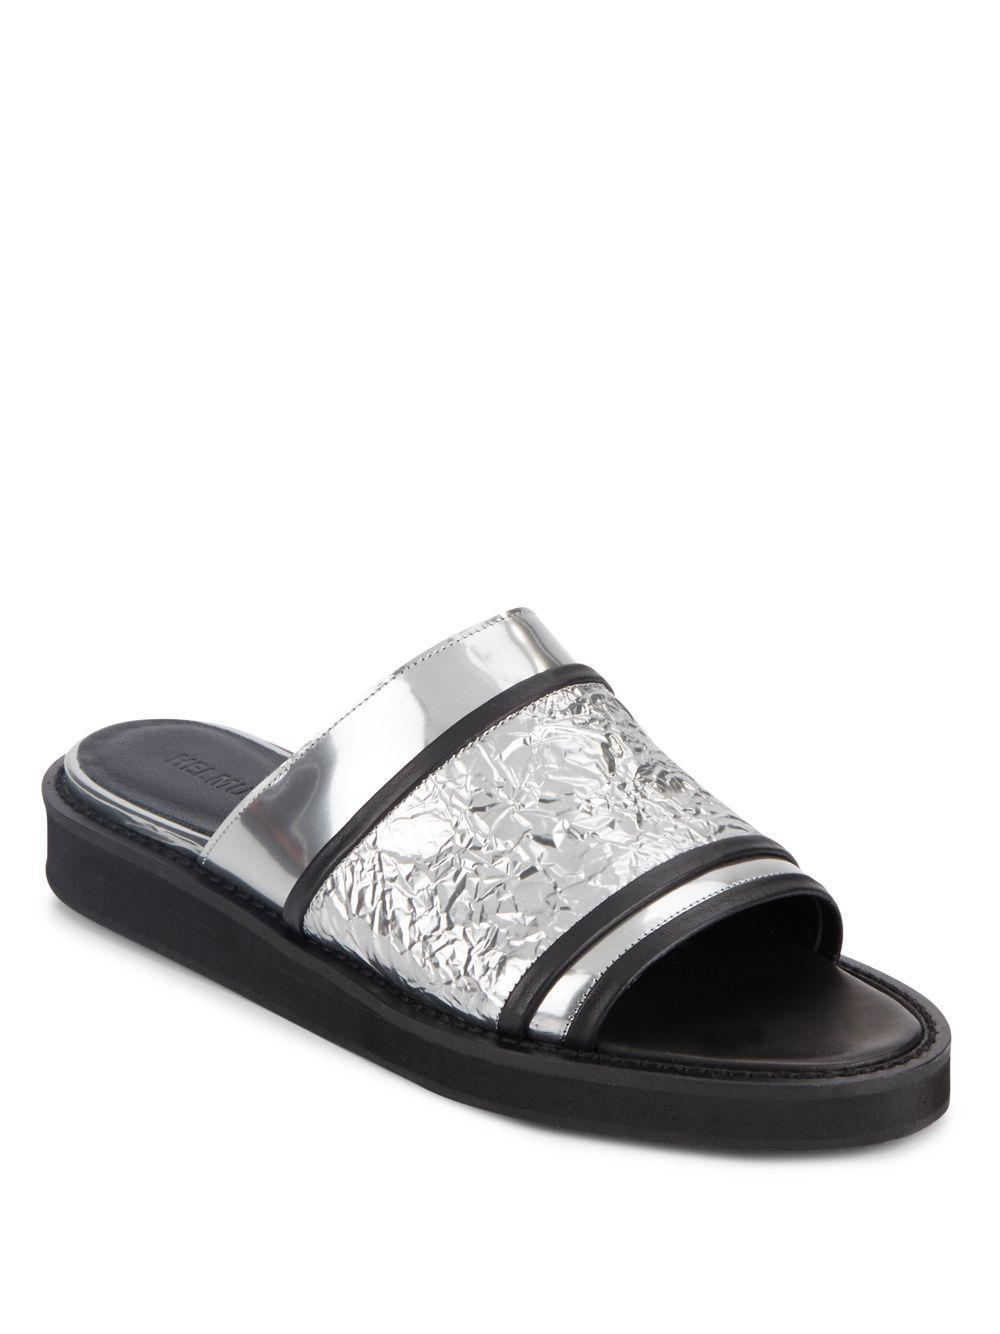 Helmut Lang Metallic Leather Sandals sale eastbay 3g4G8TYV